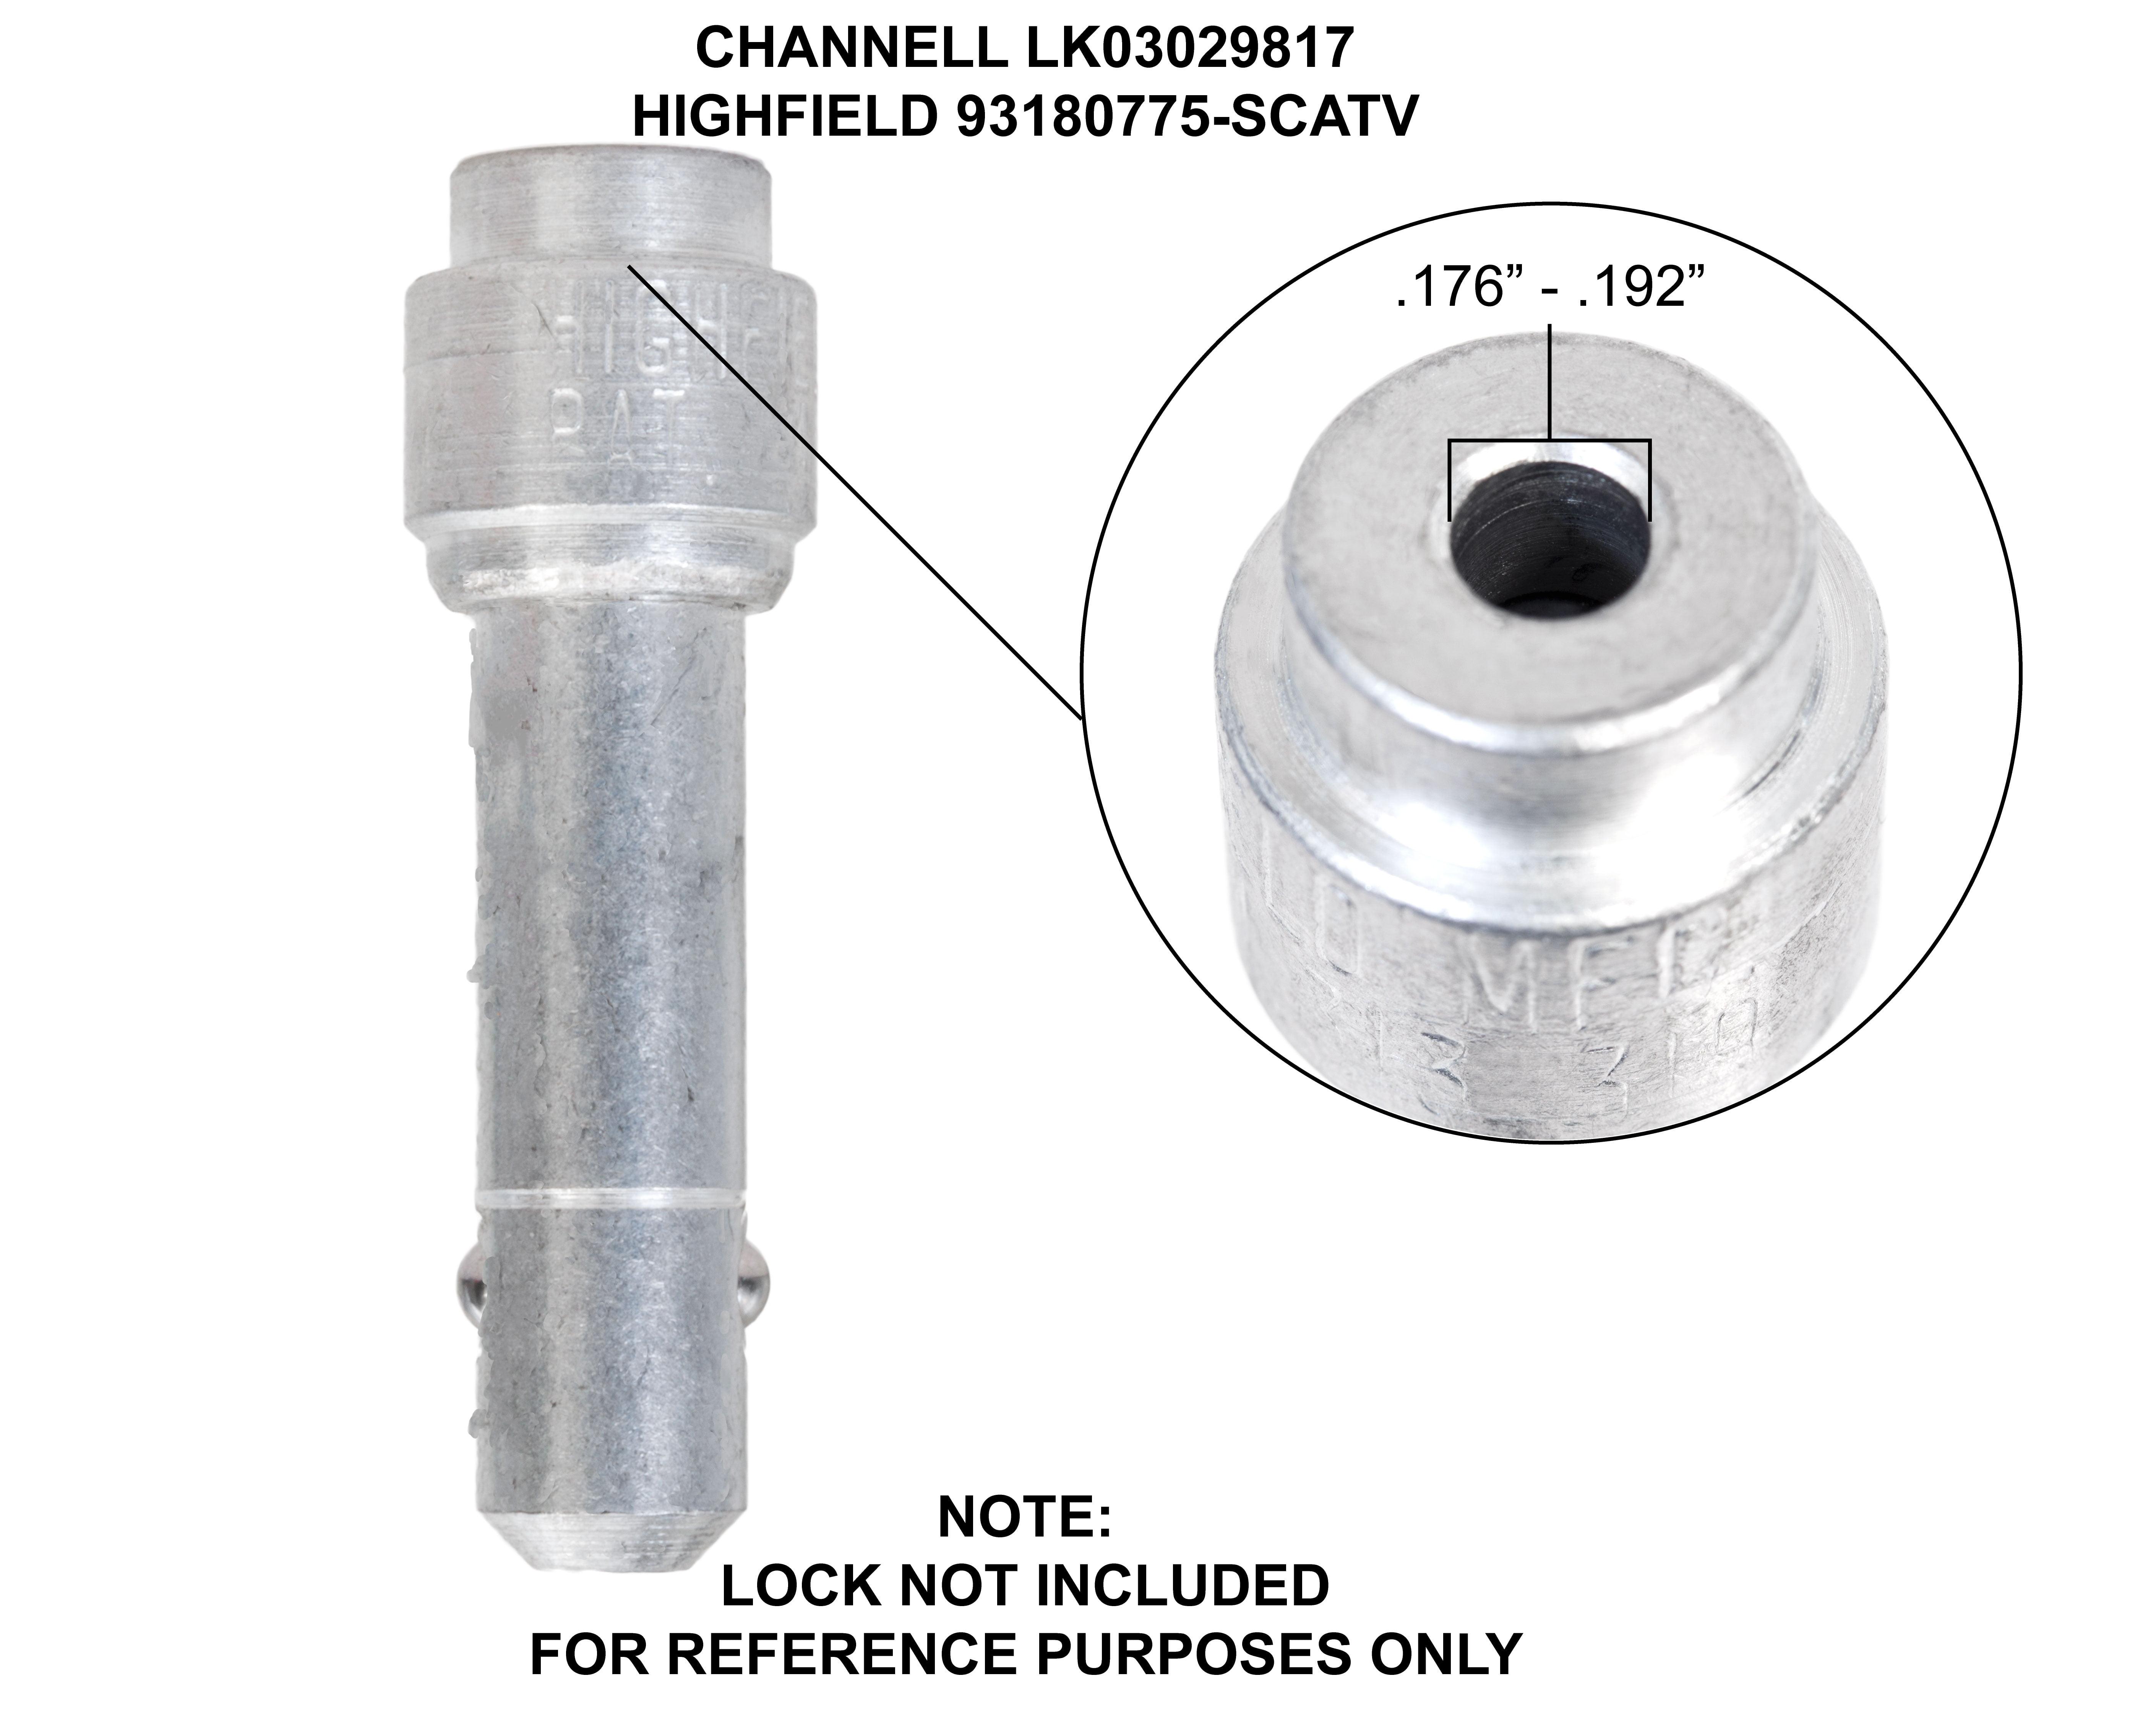 Barrel Lock Red Plunger Key Water Gas Meter Tool Barrel Lock Compat Resistant